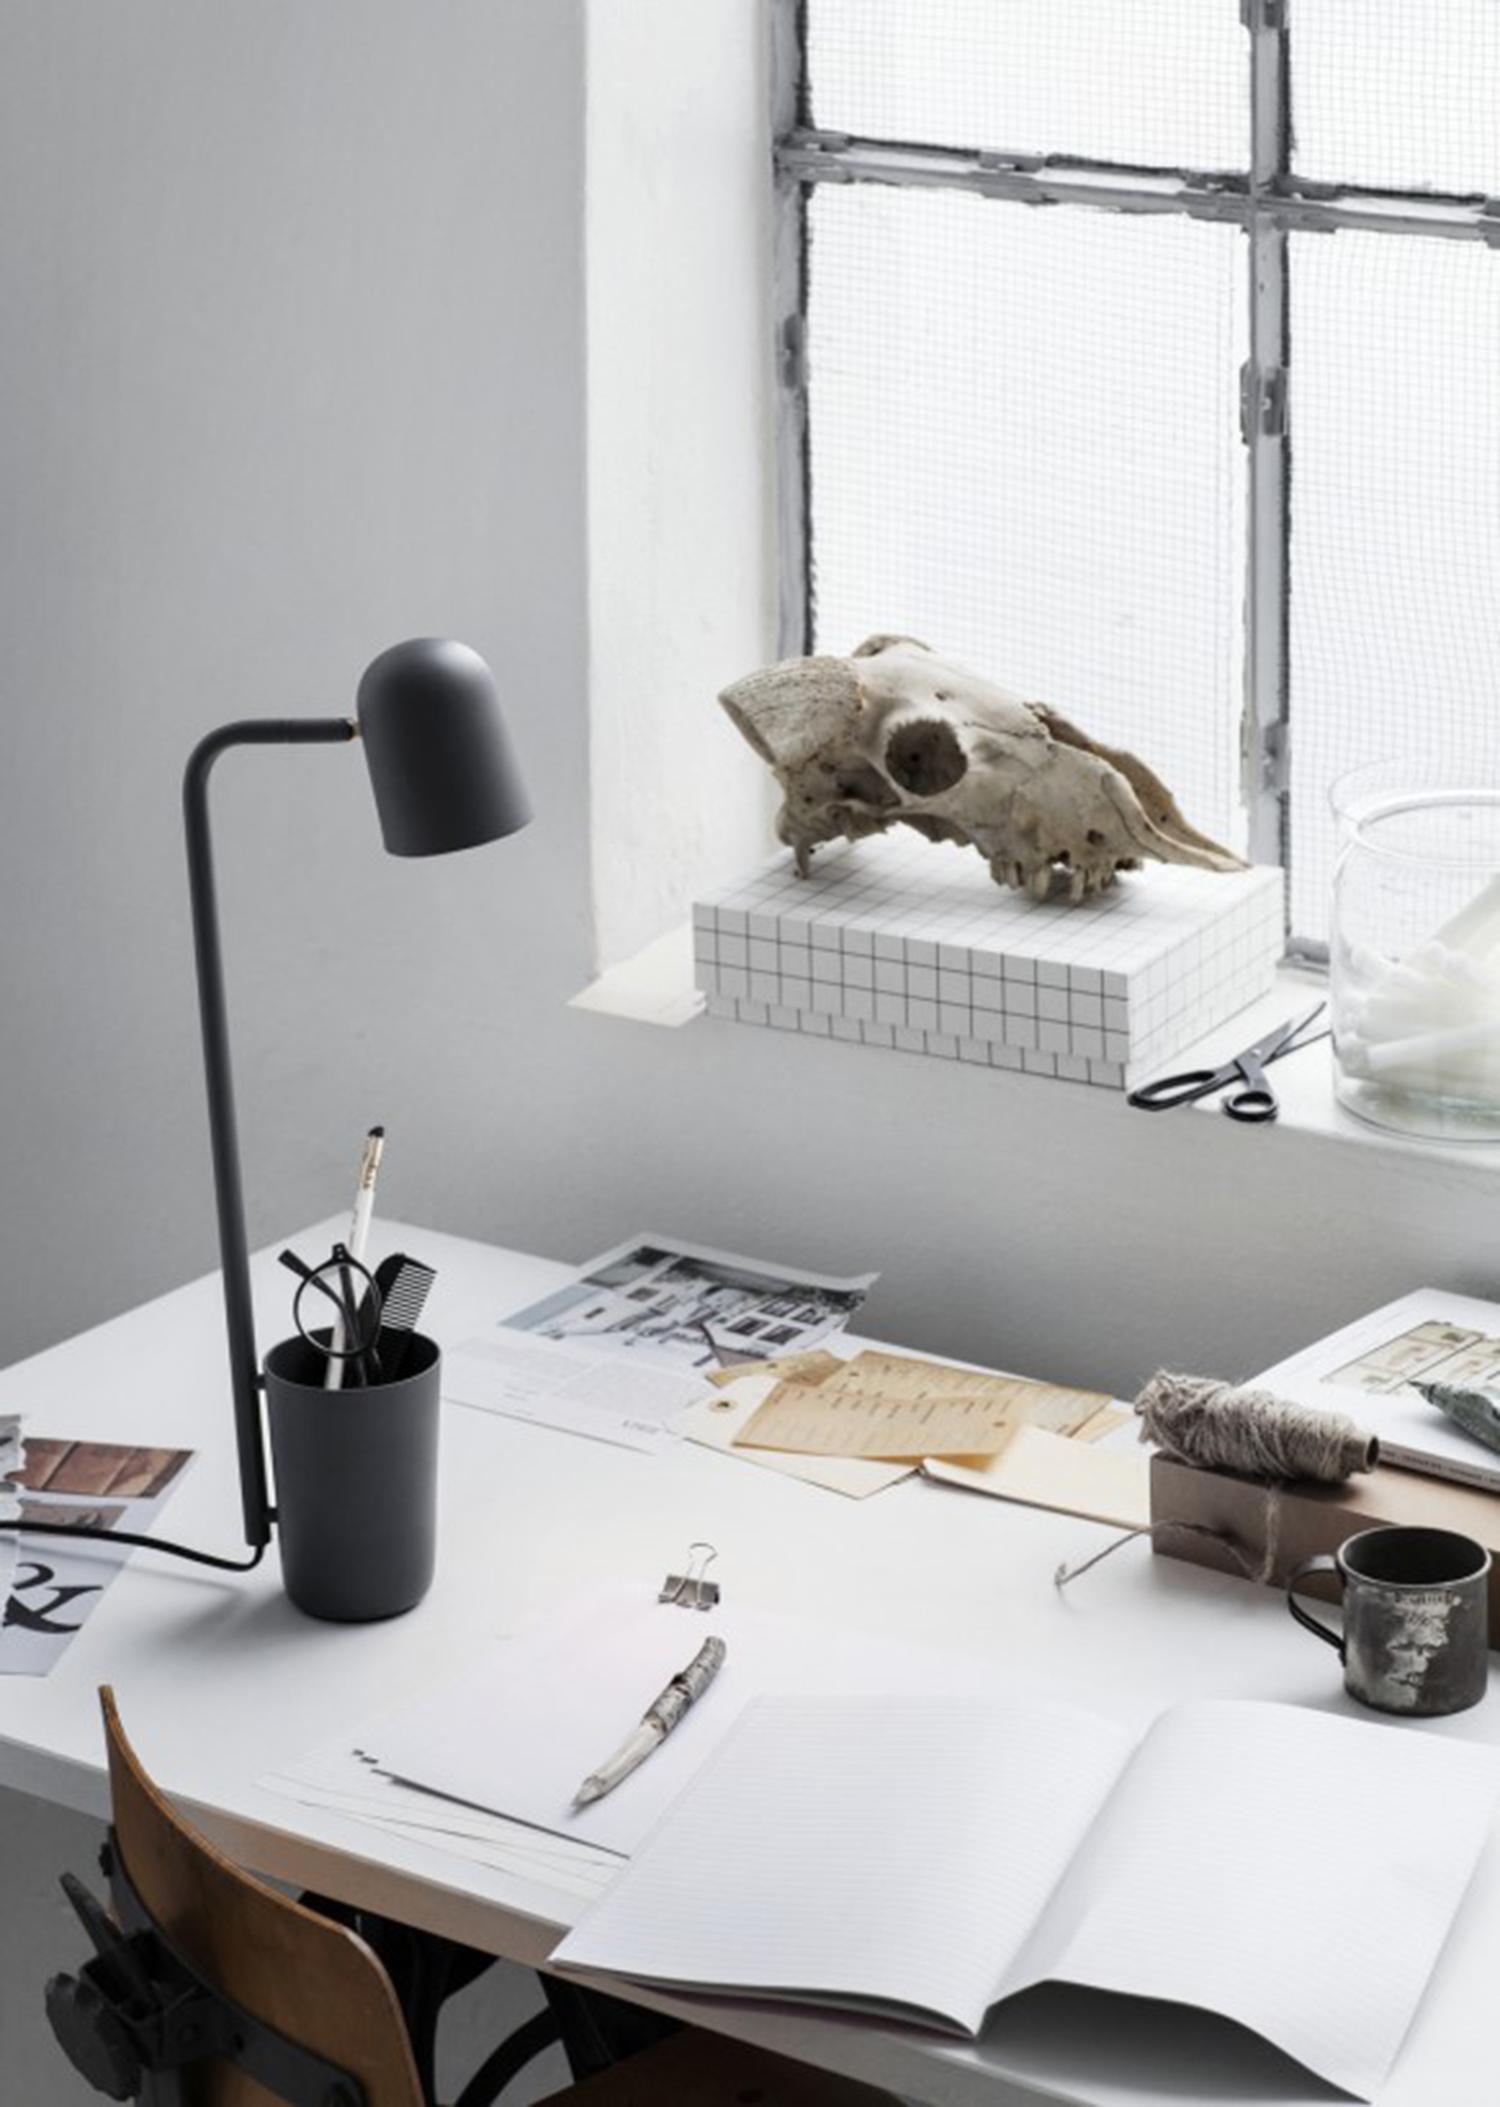 Buddy_Dark_Grey_on_desk_portrait-Low-res_Photo_Chris-Tonnesen-583x819.jpg